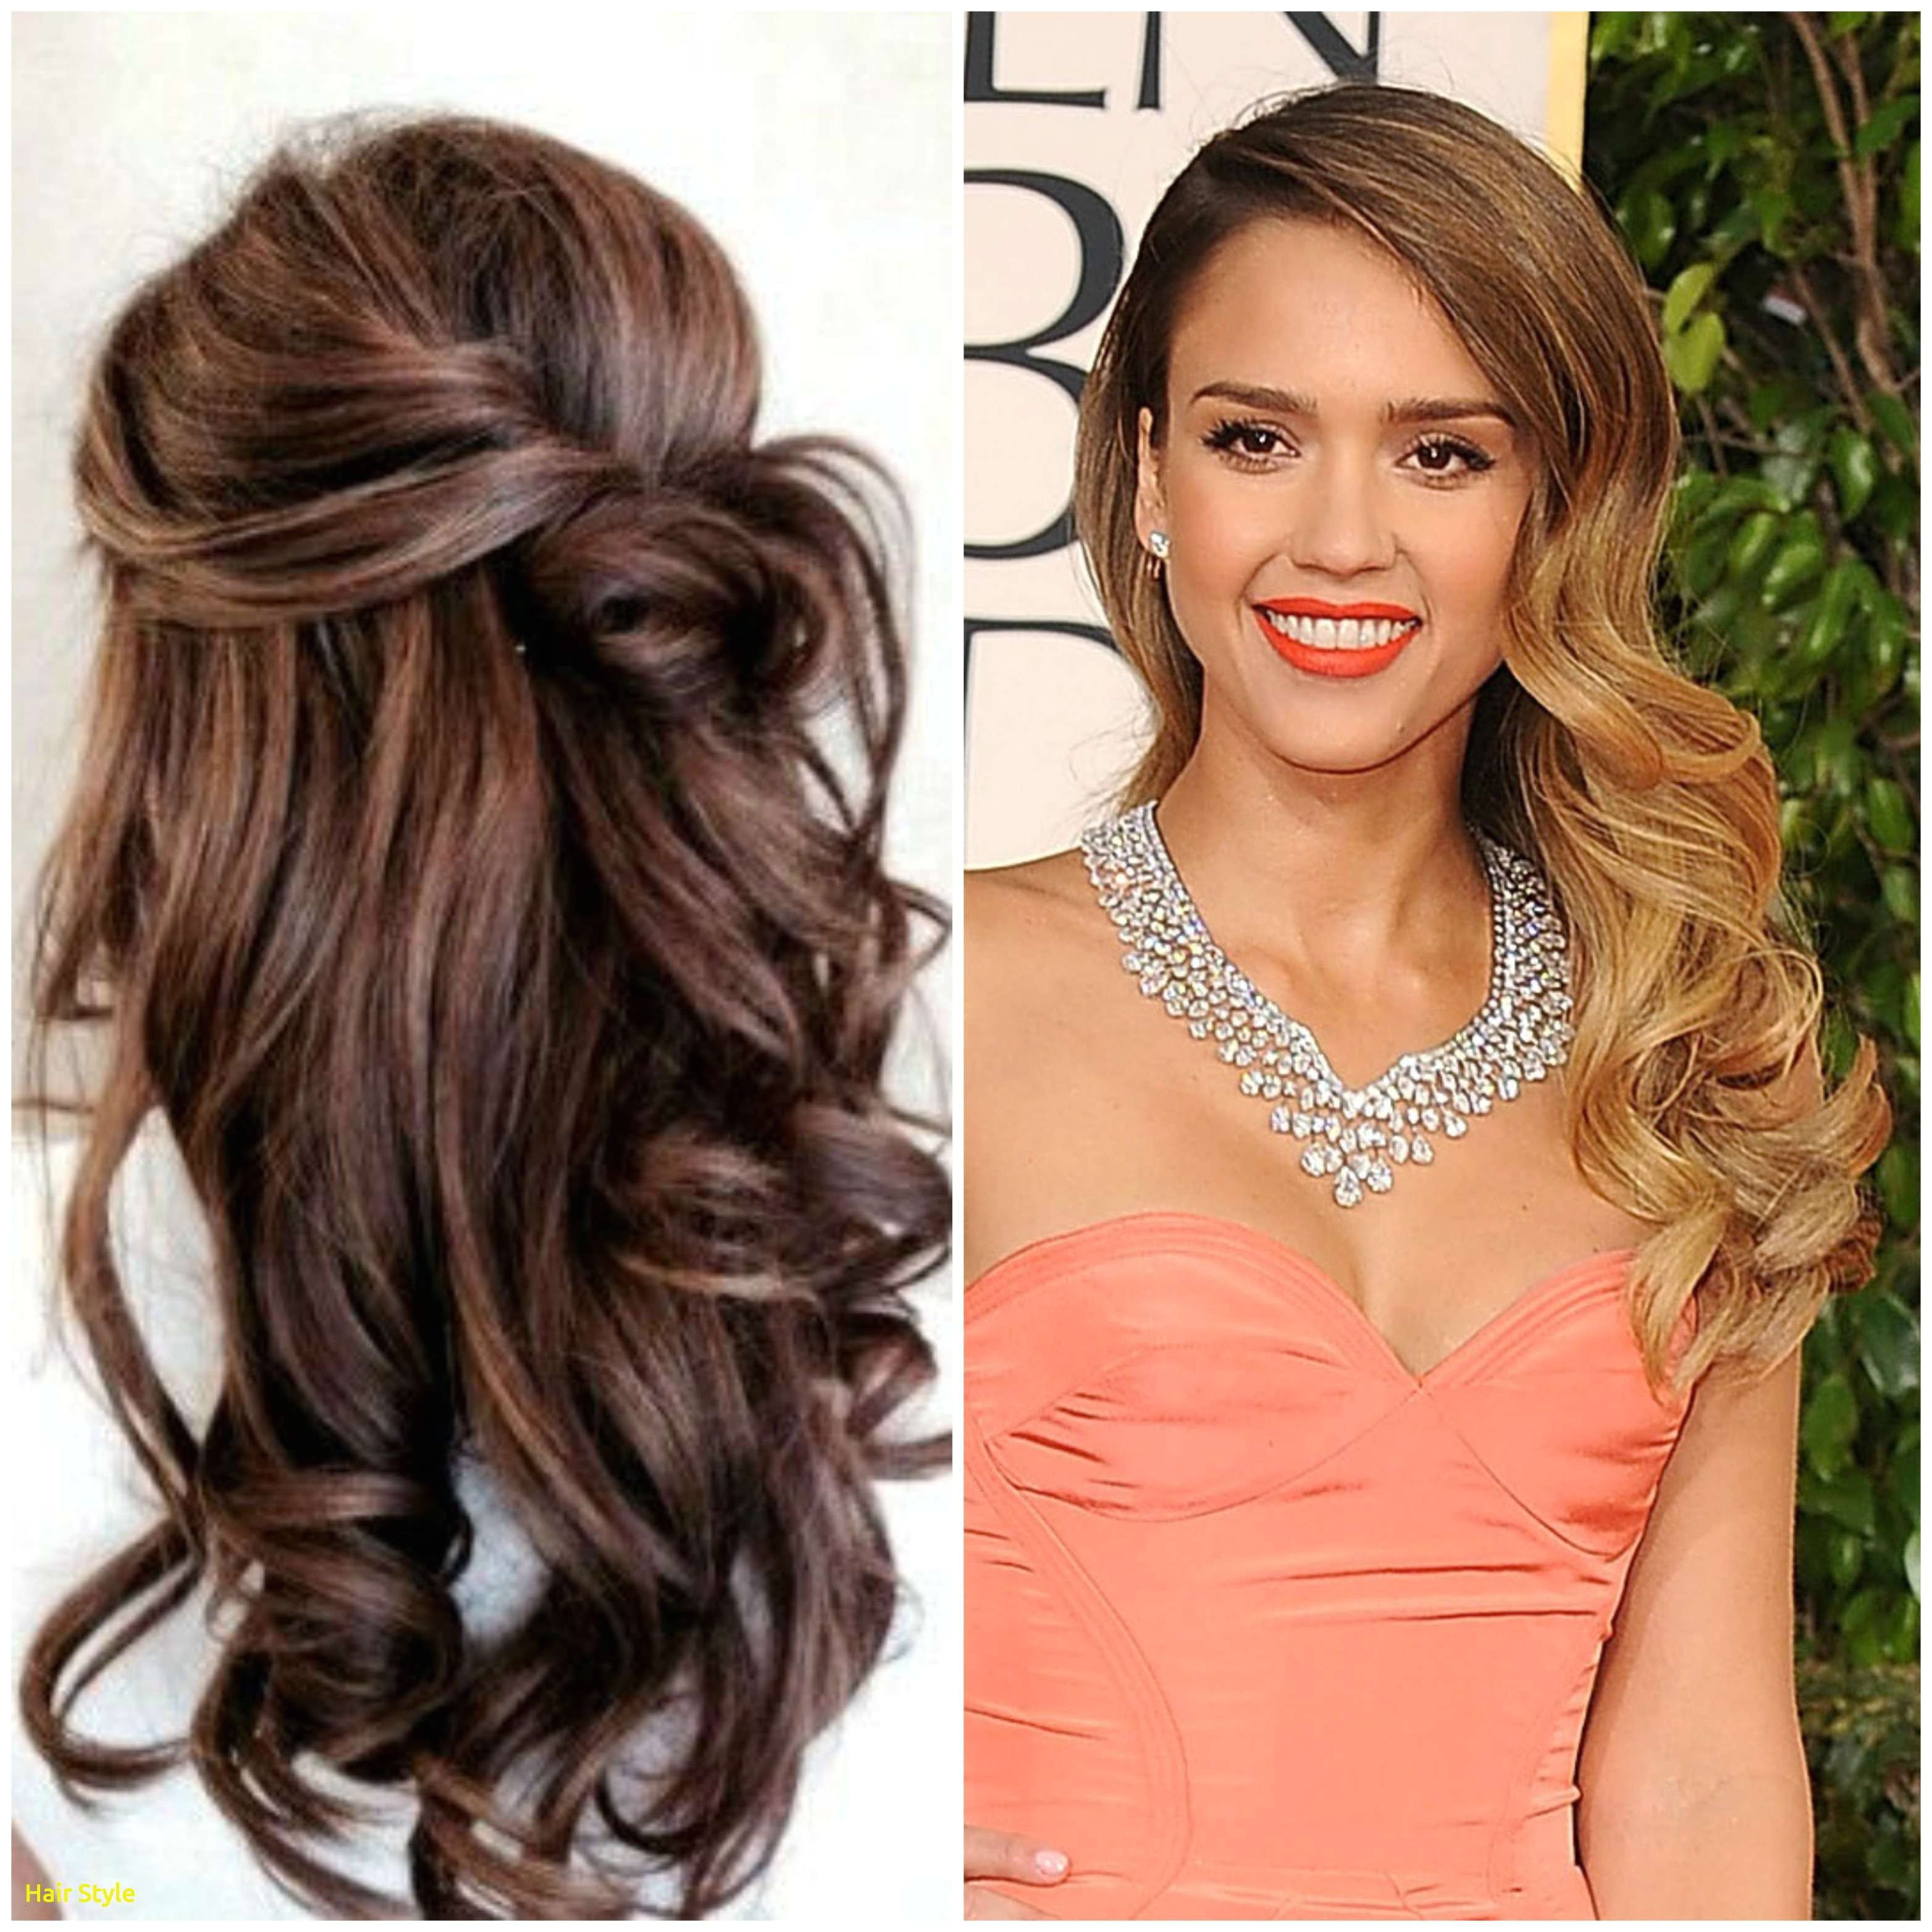 Asian Bridal Hair Styles Elegant Inspirational Updo Hairstyles for Long Hair – Aidasmakeup Asian Bridal